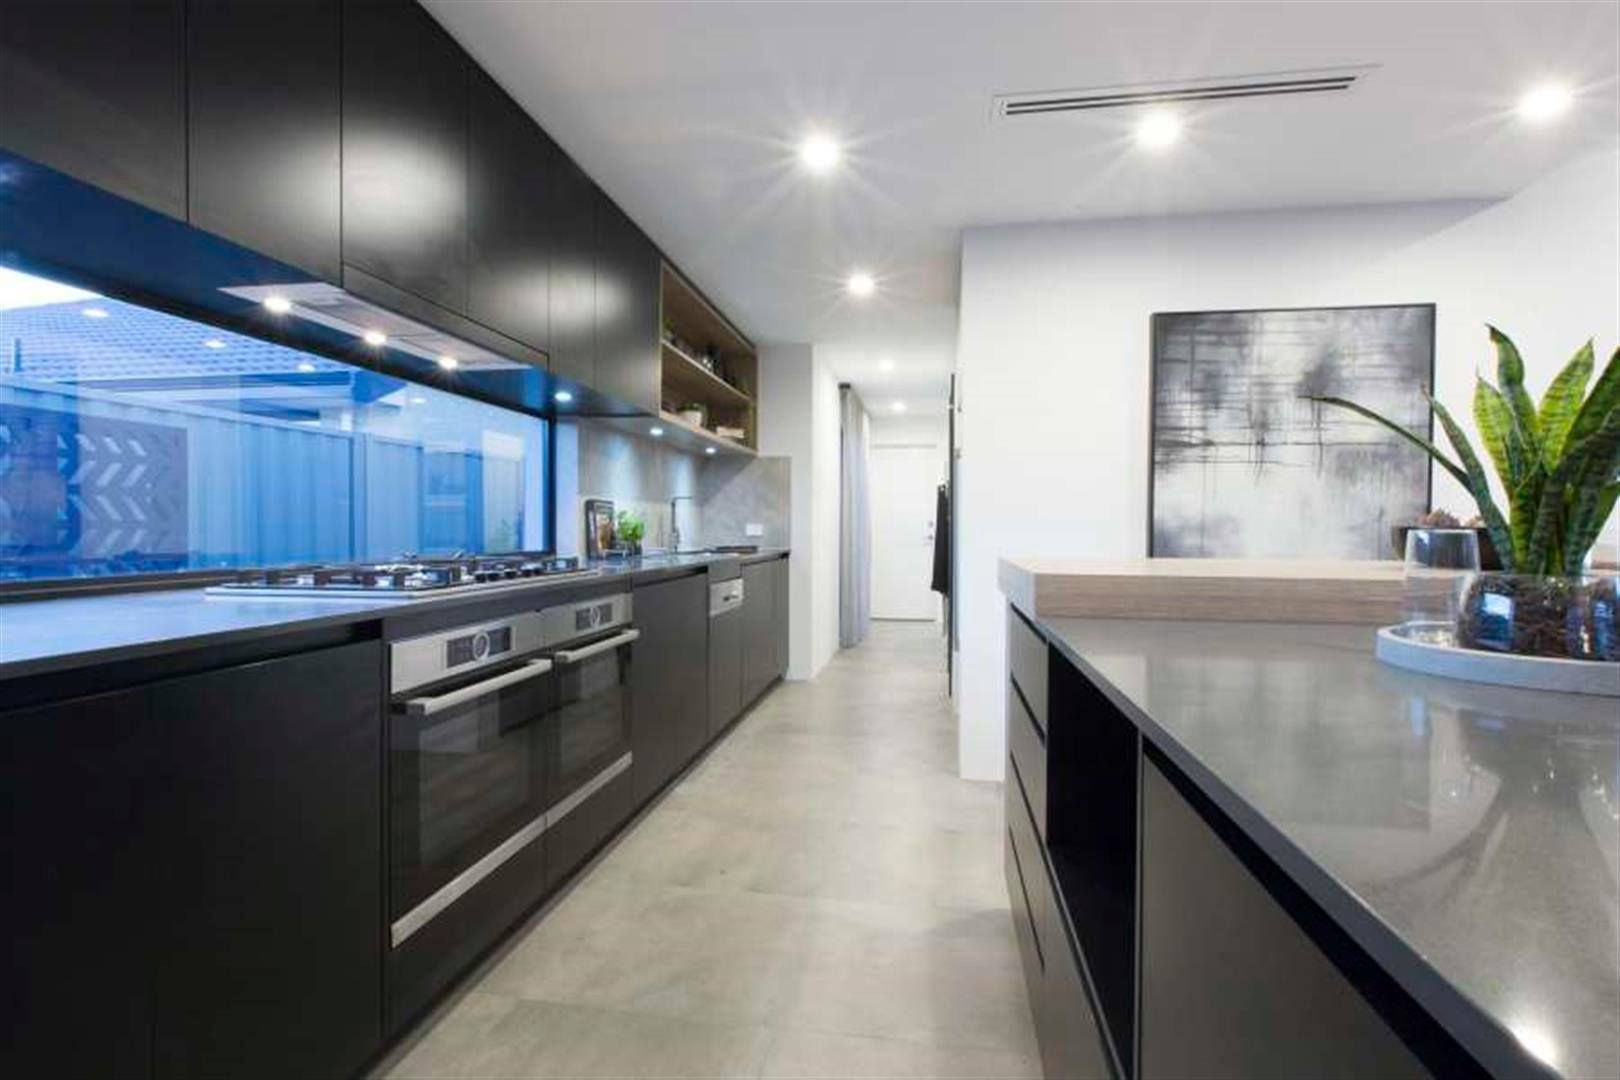 Kitchen Cabinets Perth and Mandurah